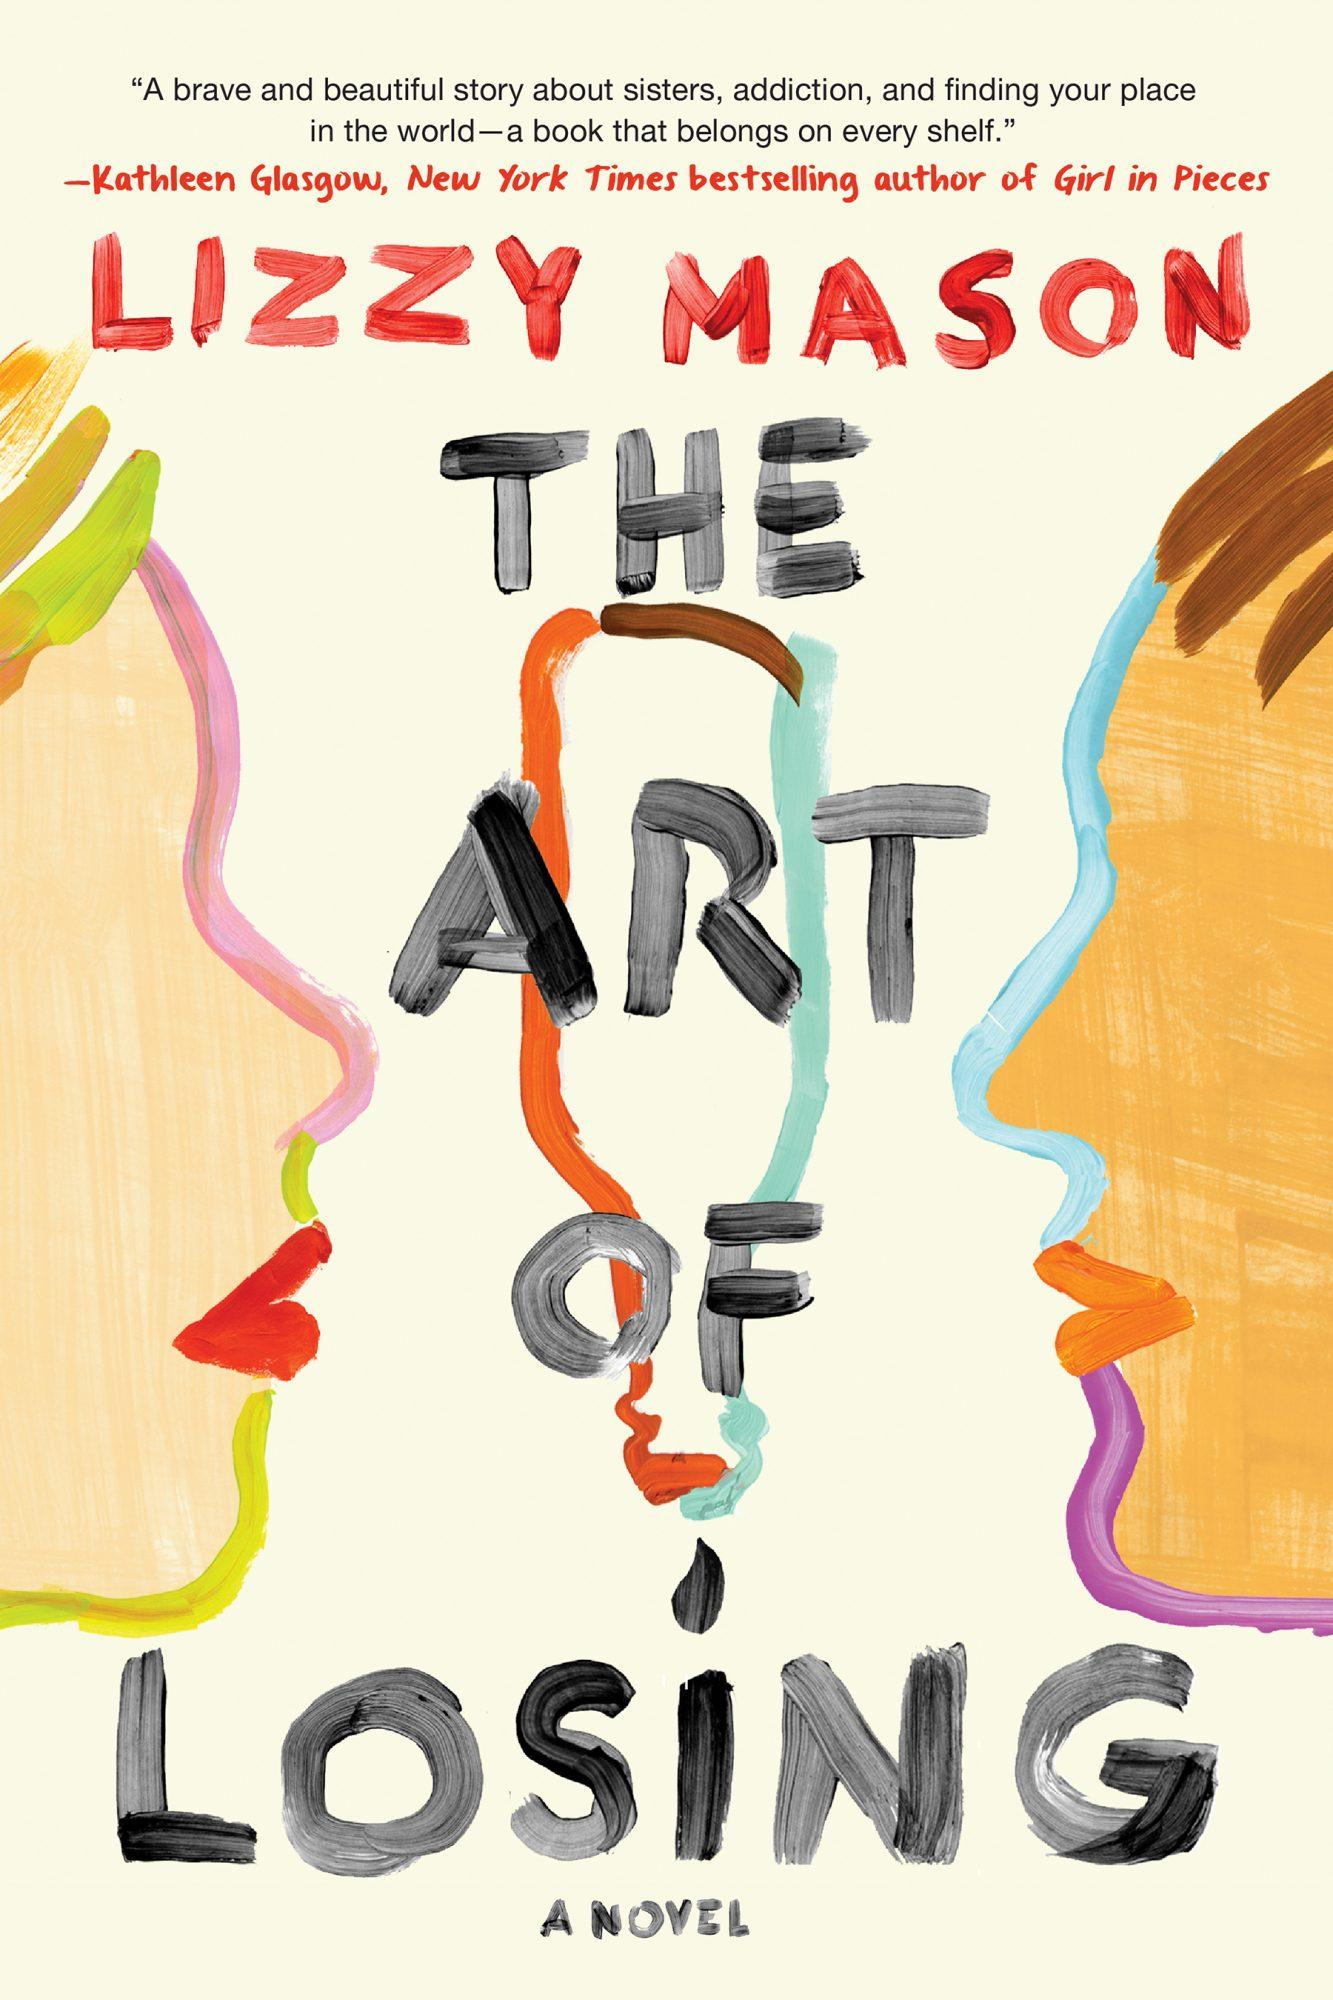 The Art of LosingBy LIZZY MASONCR: Penguin Random House